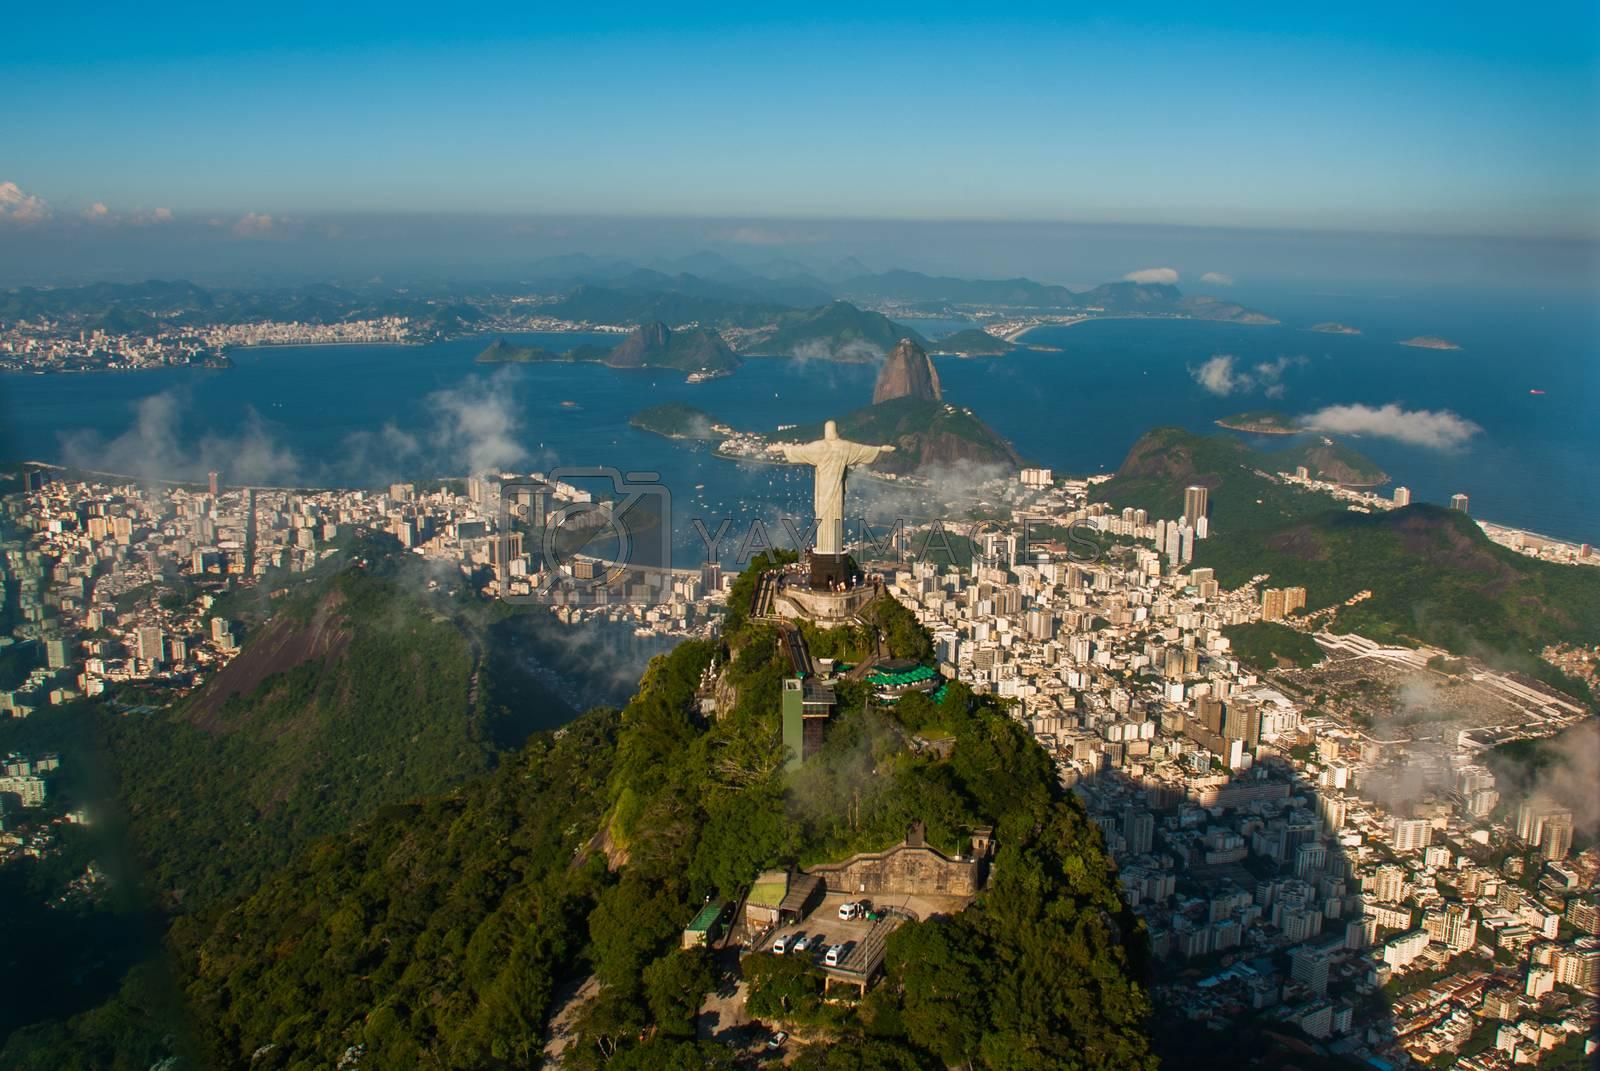 Rio de Janeiro, Brazil: Aerial view of Rio de Janeiro with Christ Redeemer and Corcovado Mountain. Beautiful top view.